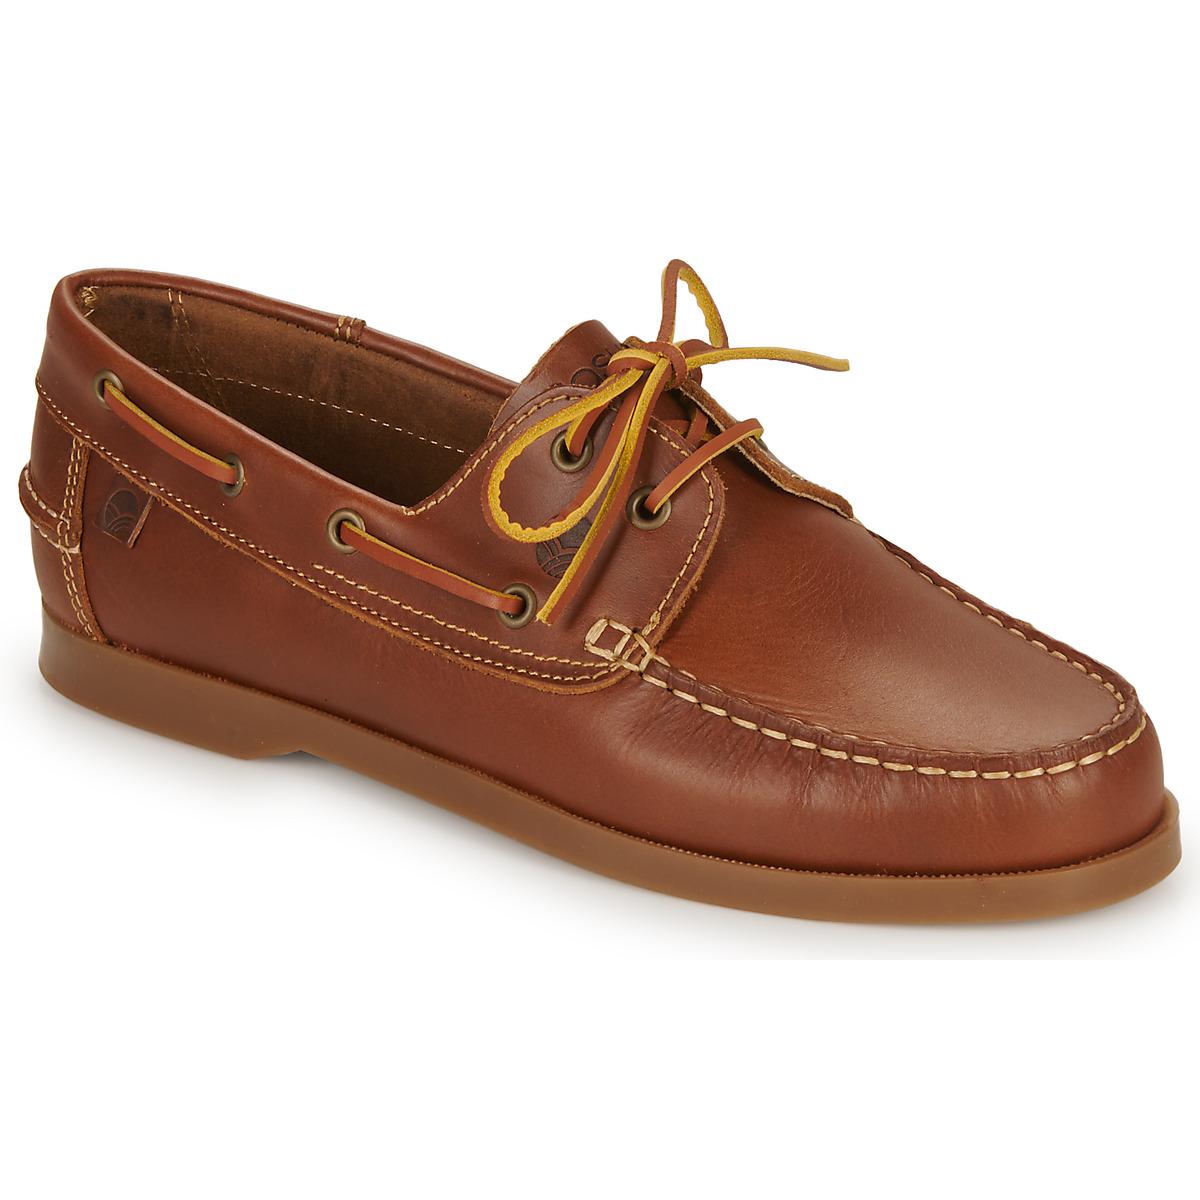 d8dc61d2f36e Mocassins et Chaussures bateau homme - grand choix de Mocassins   Chaussures  bateau - Livraison Gratuite avec Spartoo.com !